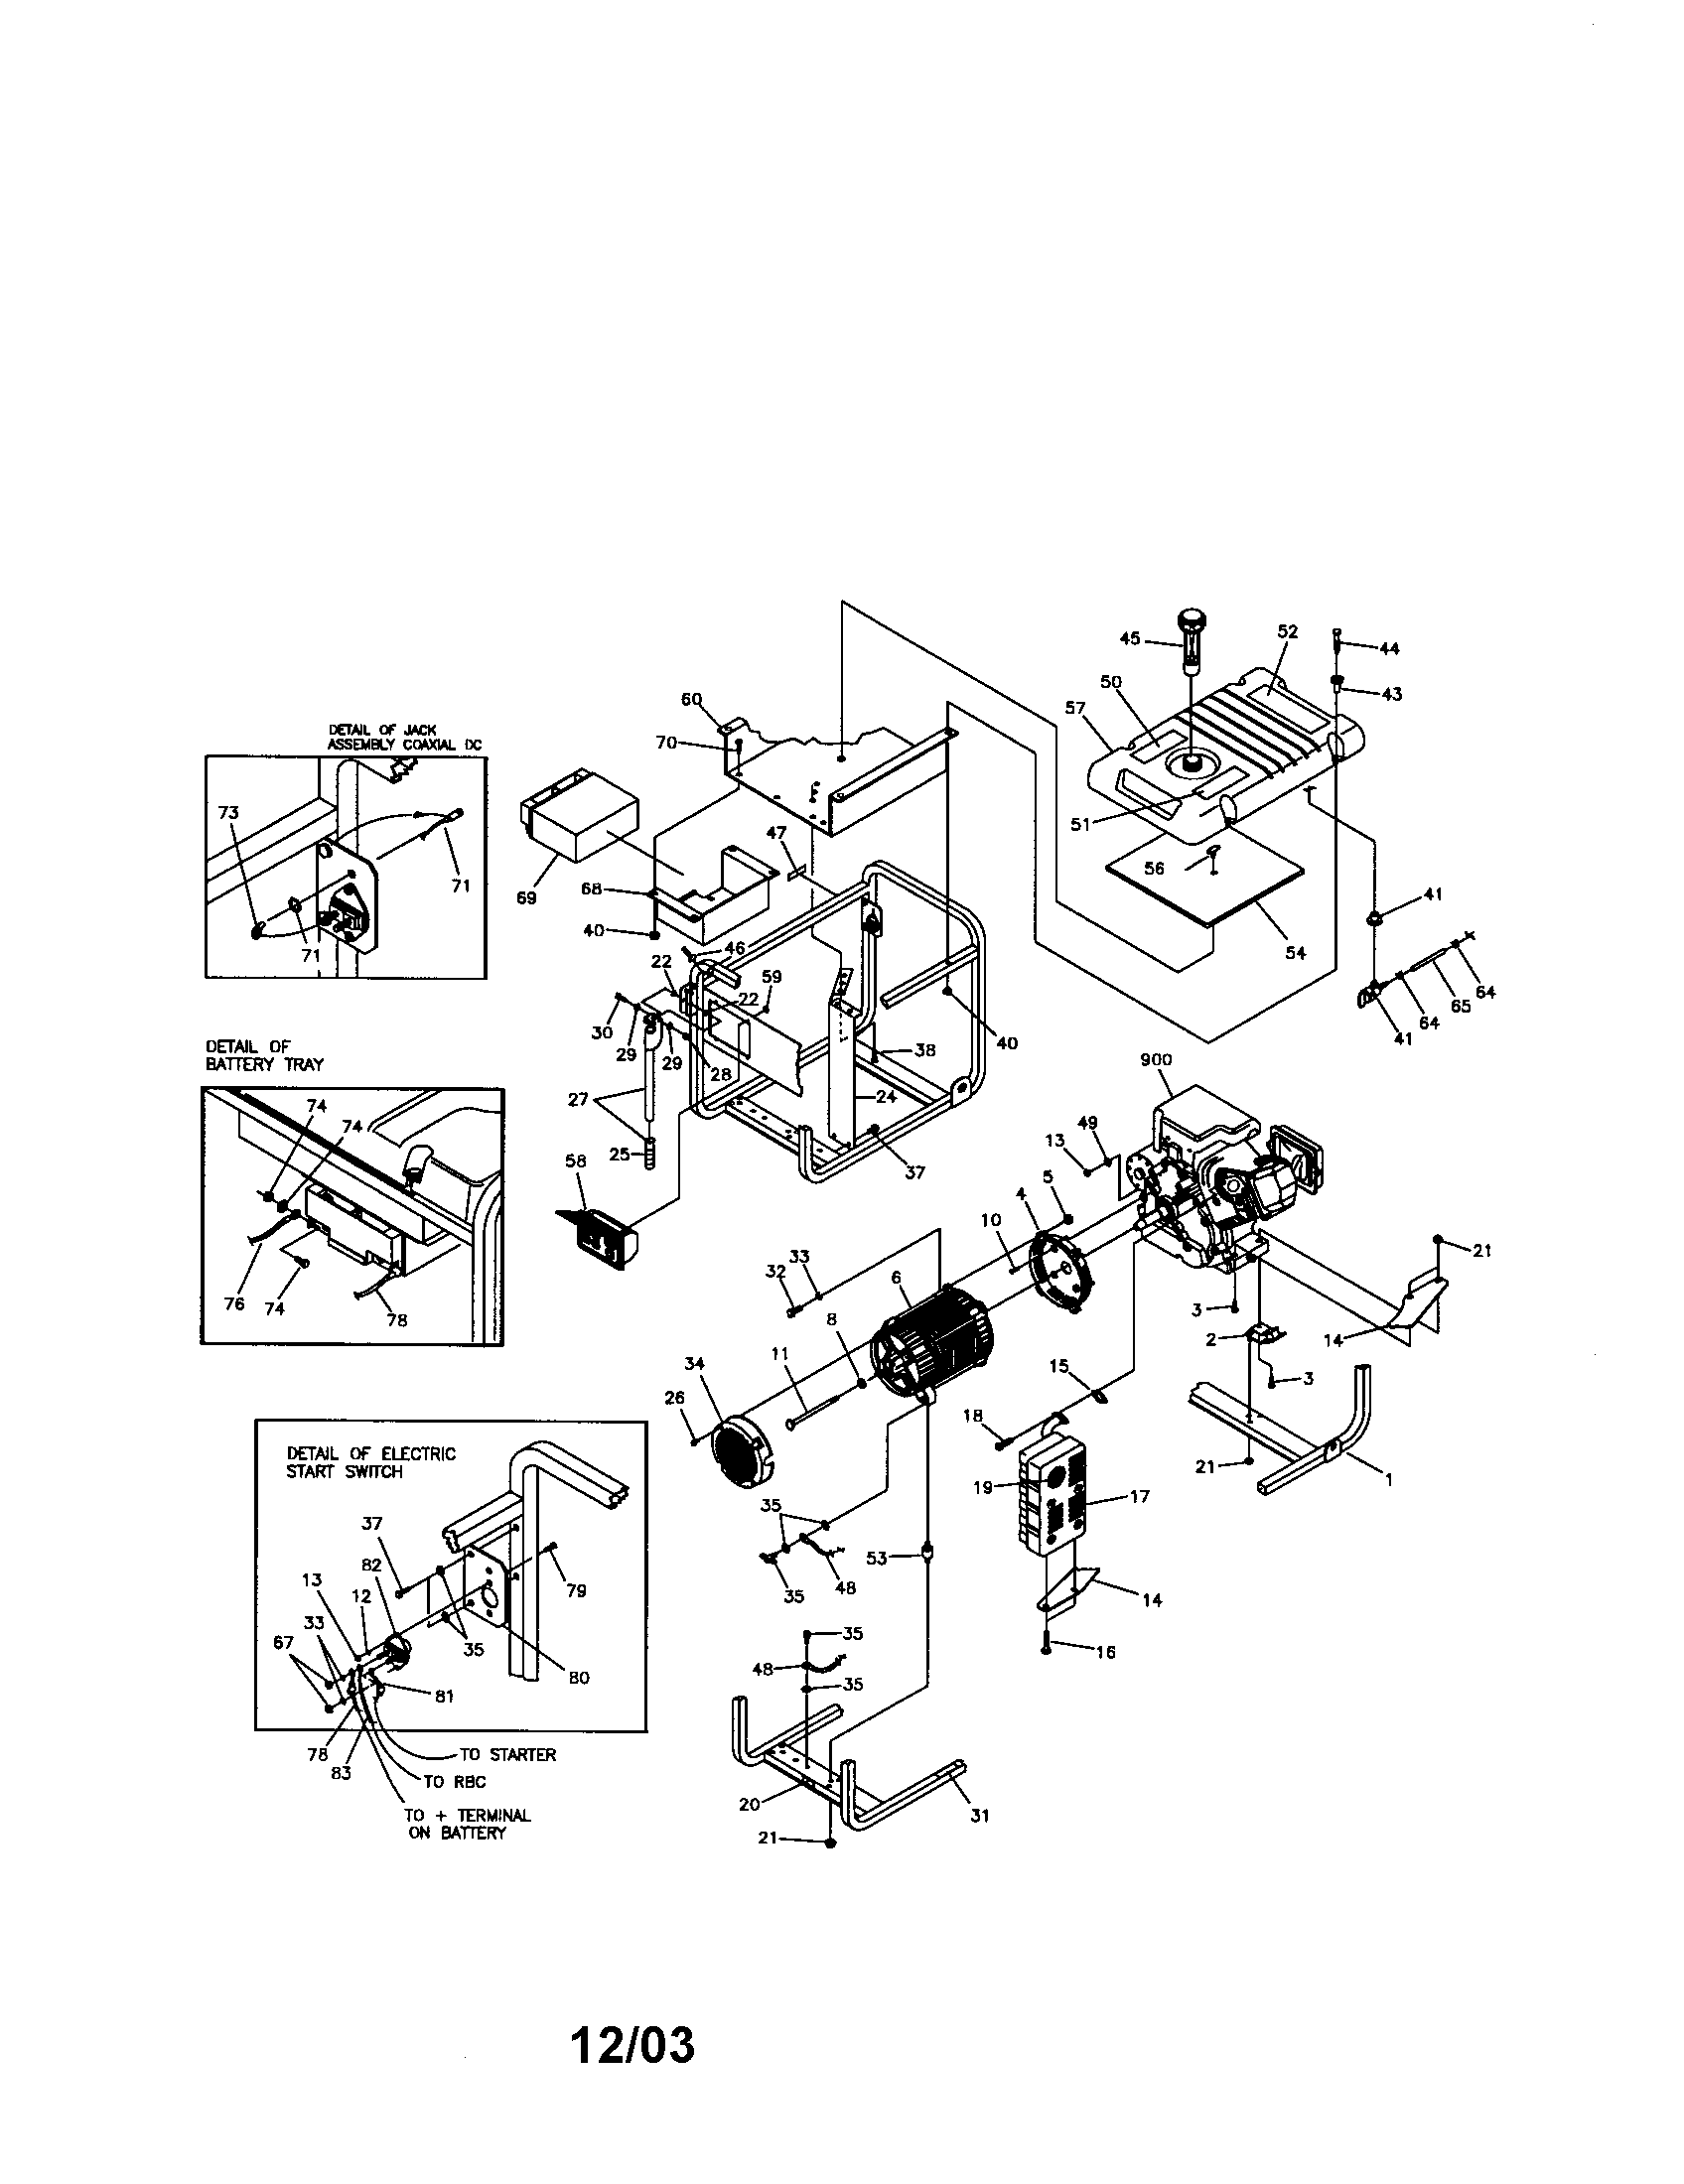 Briggs-Stratton model 01893 generator genuine parts